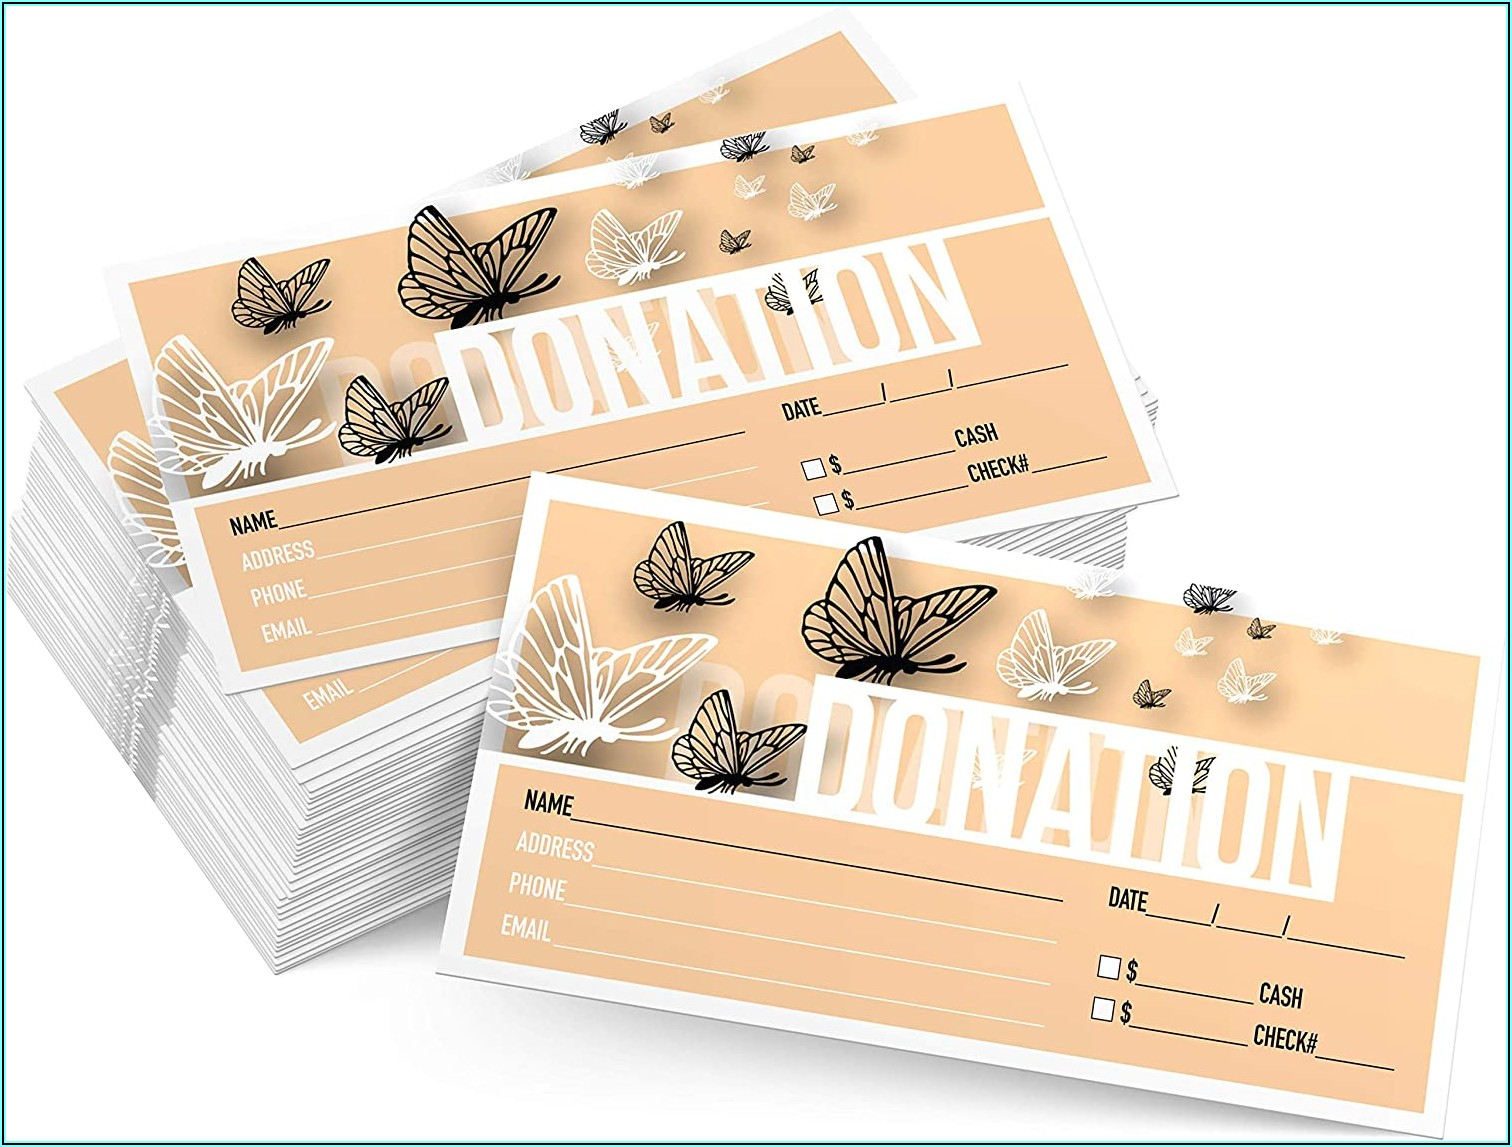 Custom Printed Tithe Envelopes